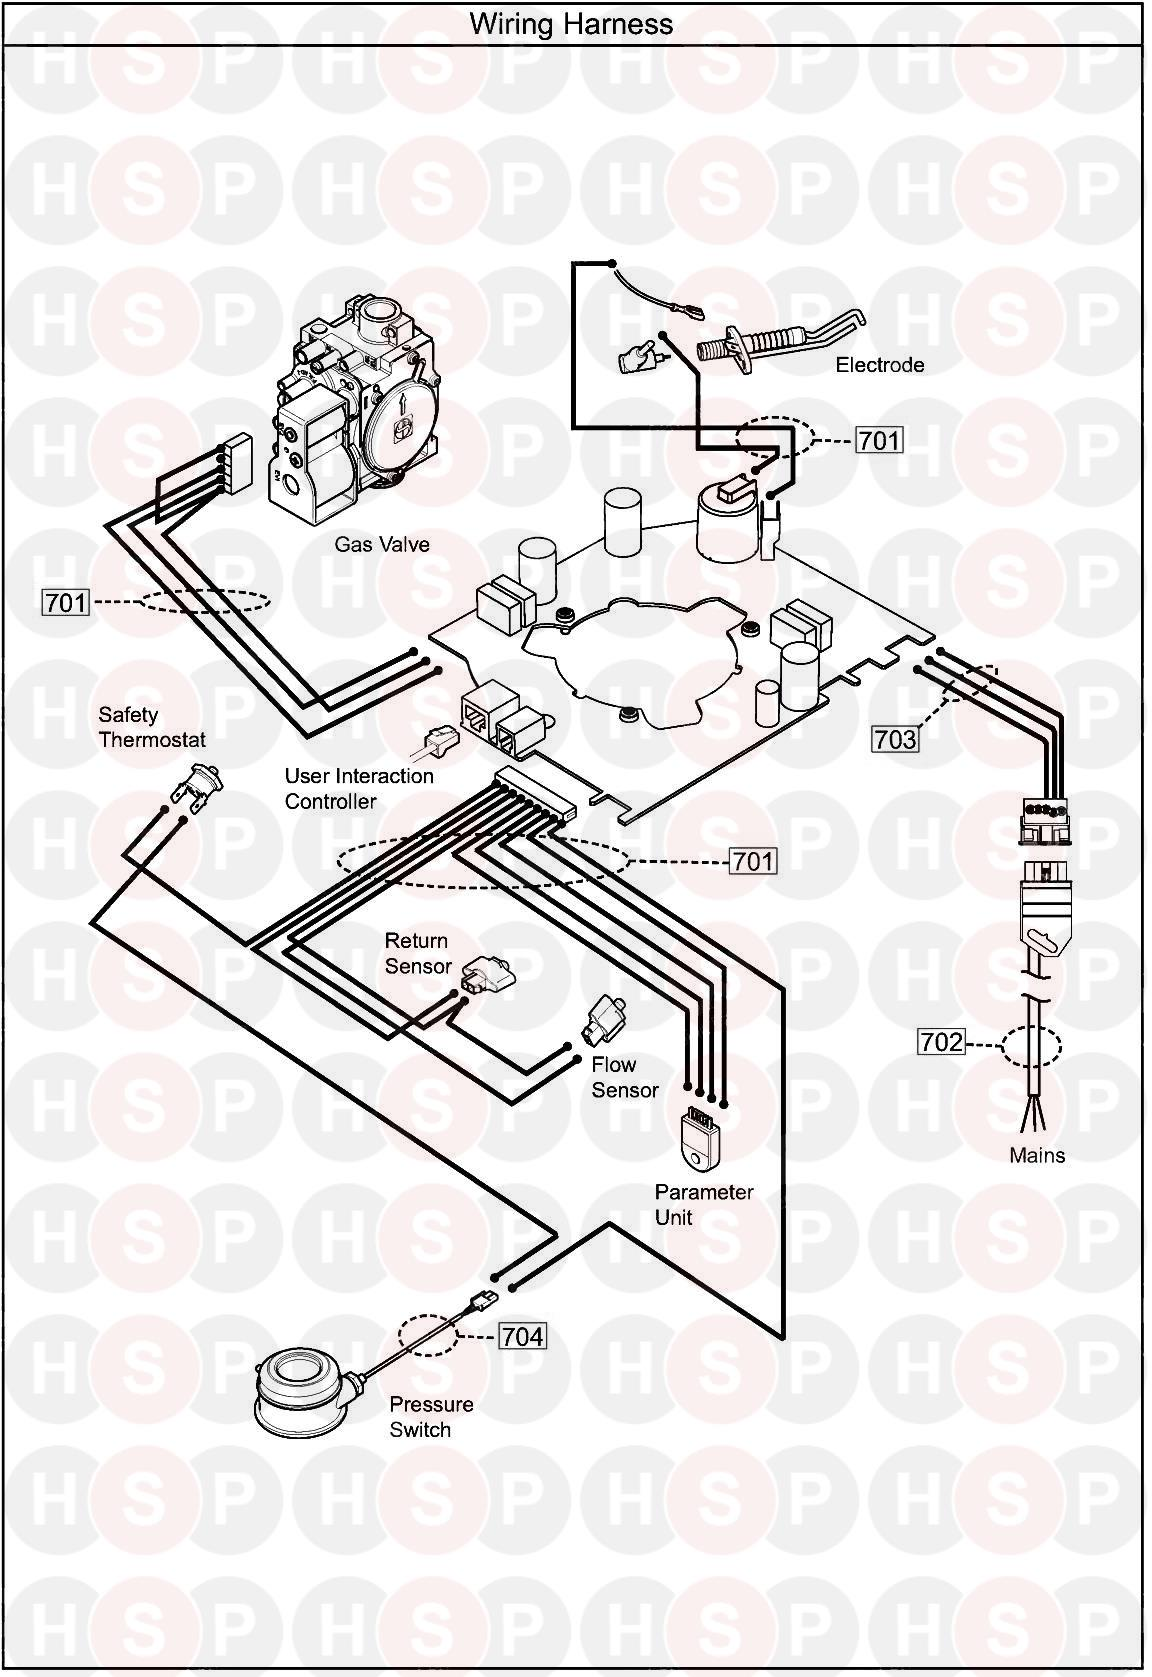 baxi ecoblue heat 21  wiring harness  diagram